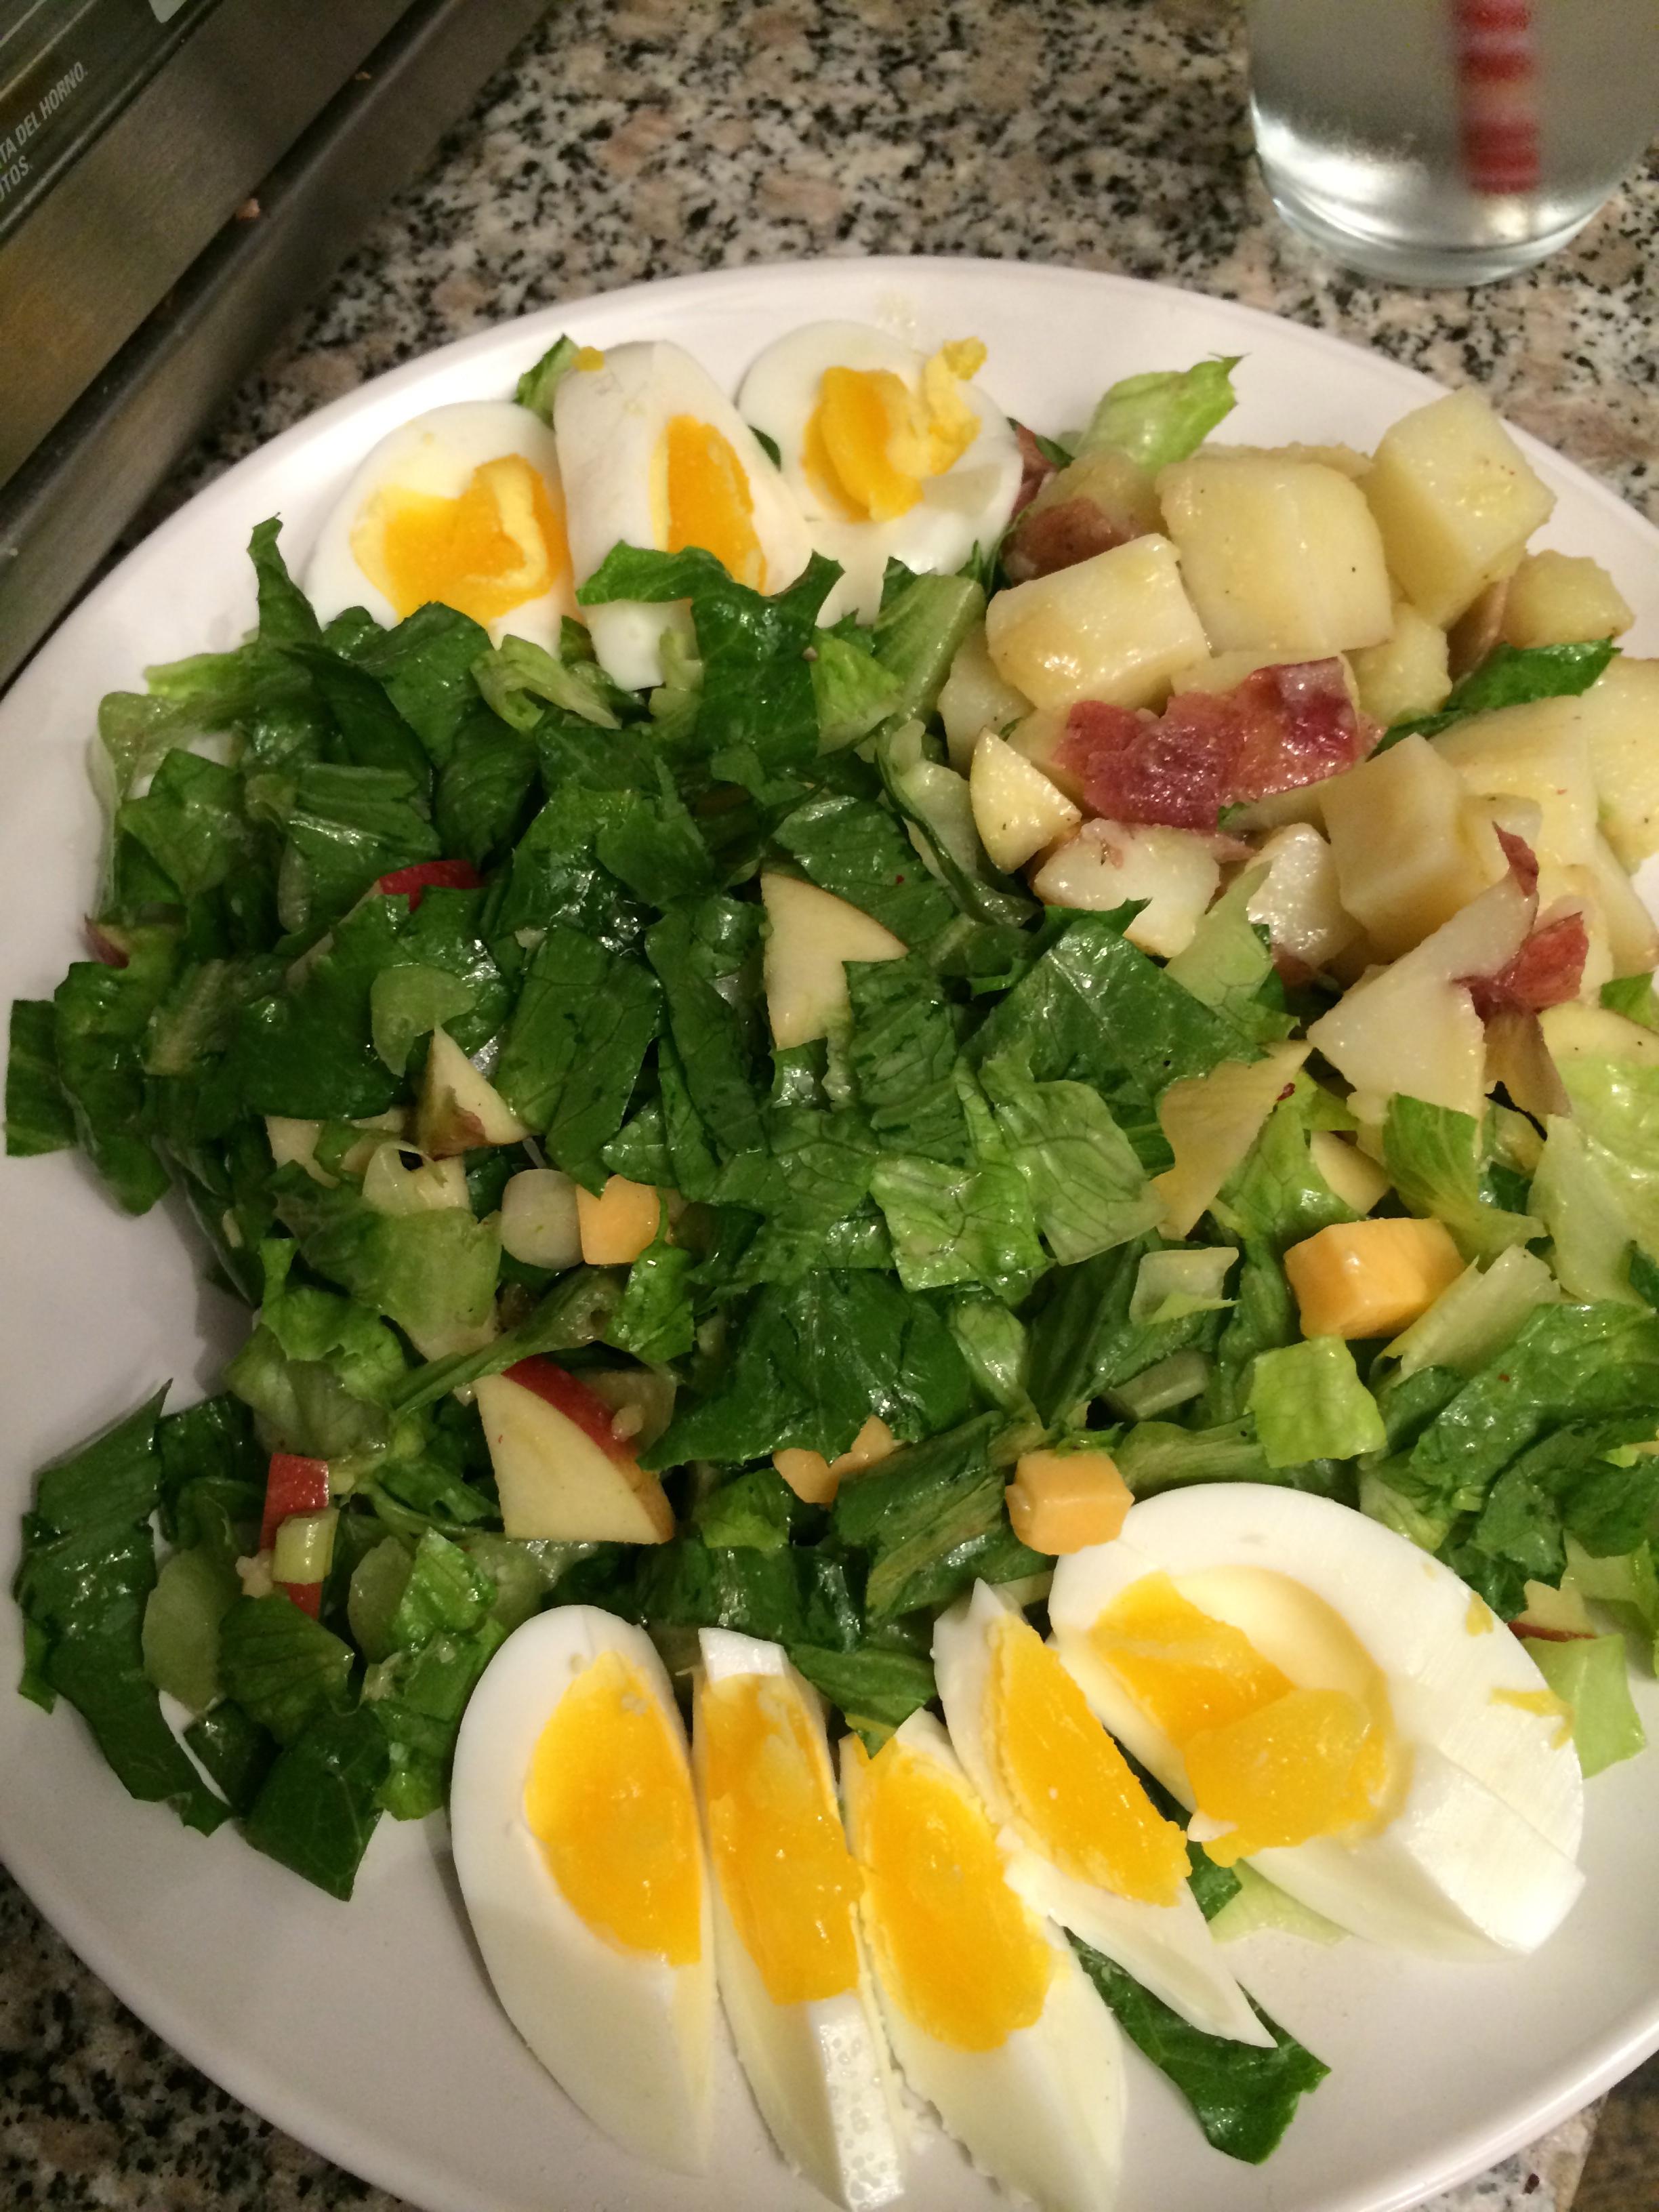 My dinner salad